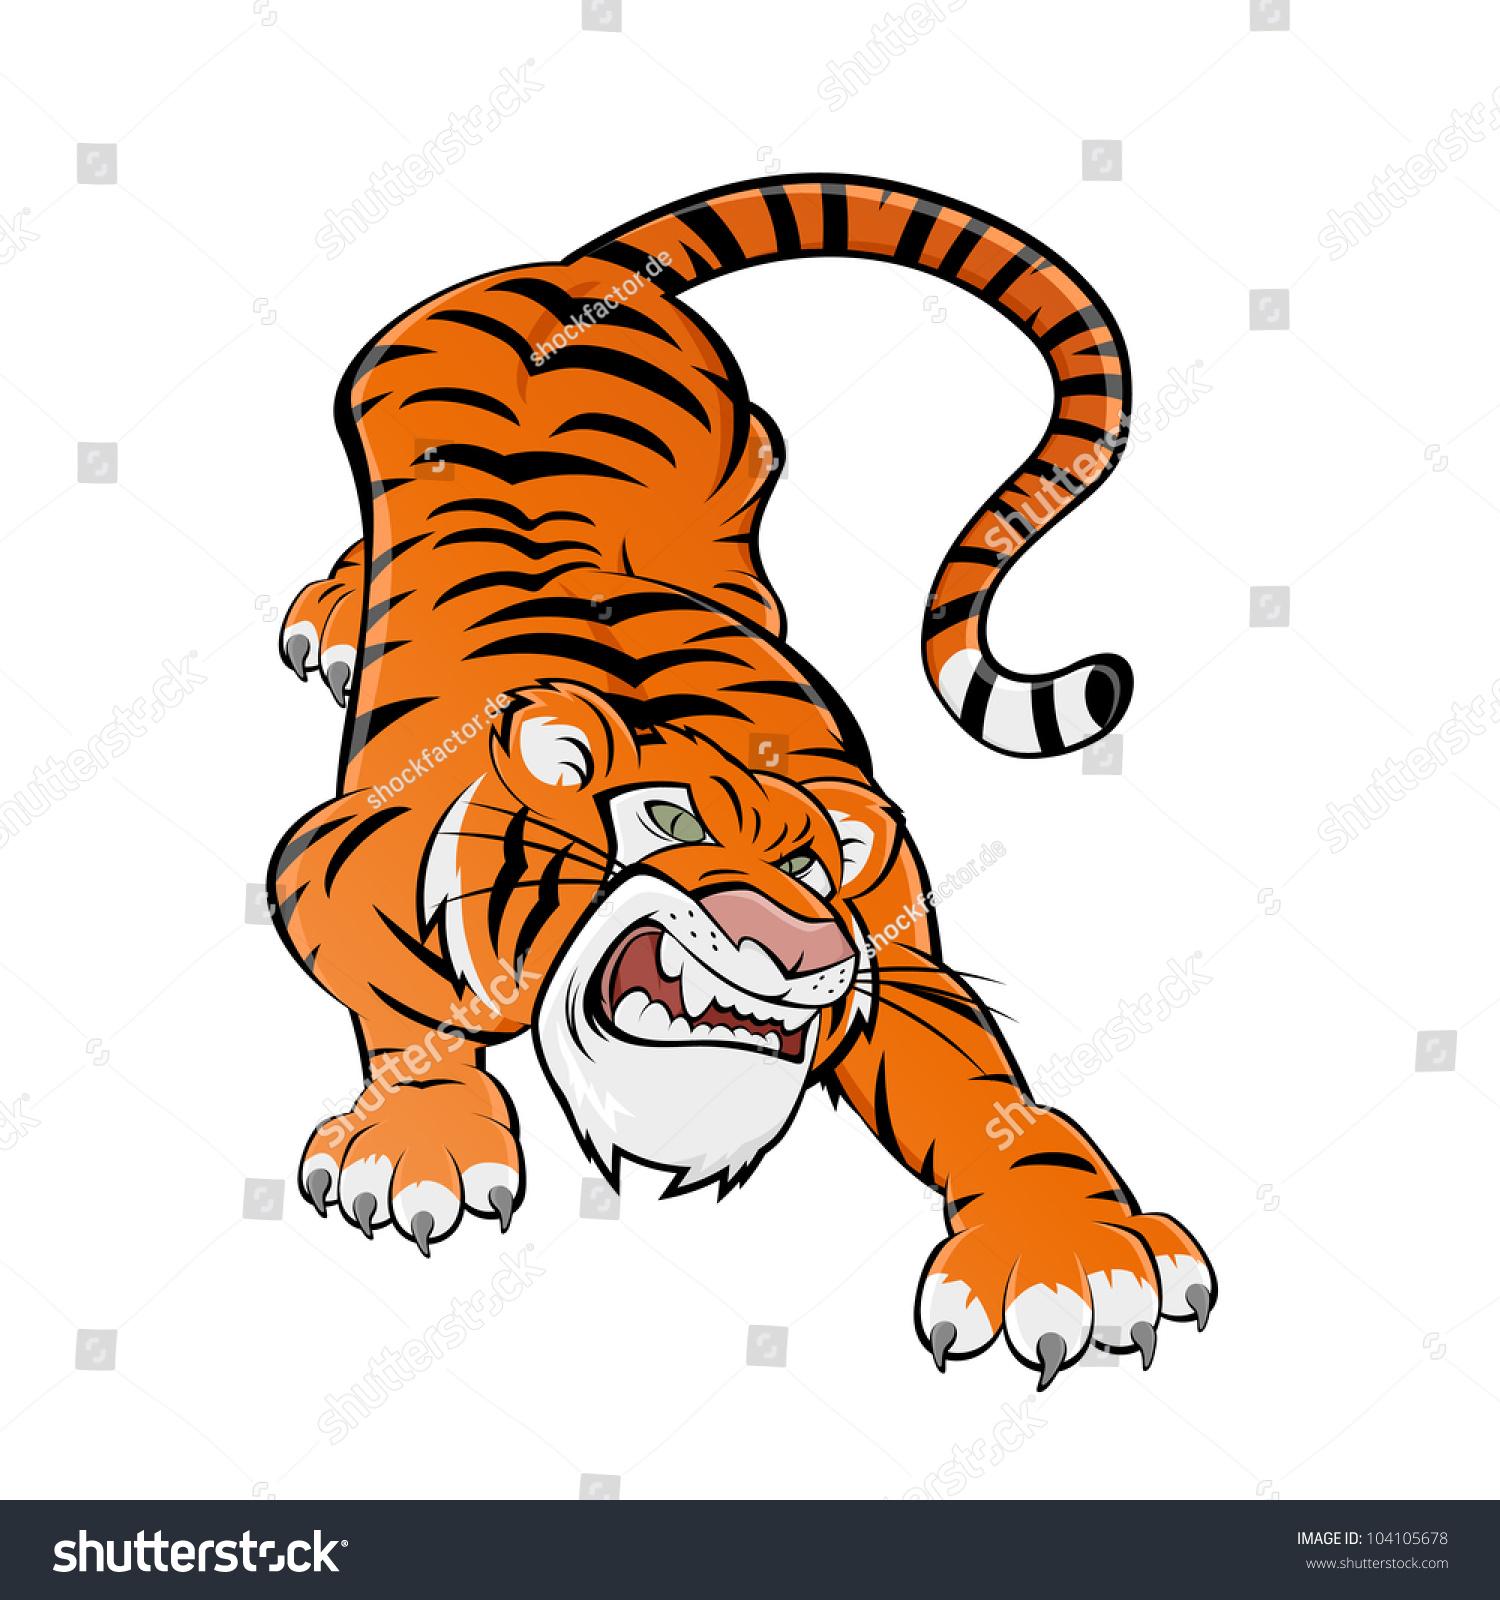 Tiger Cartoon Stock Photos, Royalty-Free Images & Vectors ...